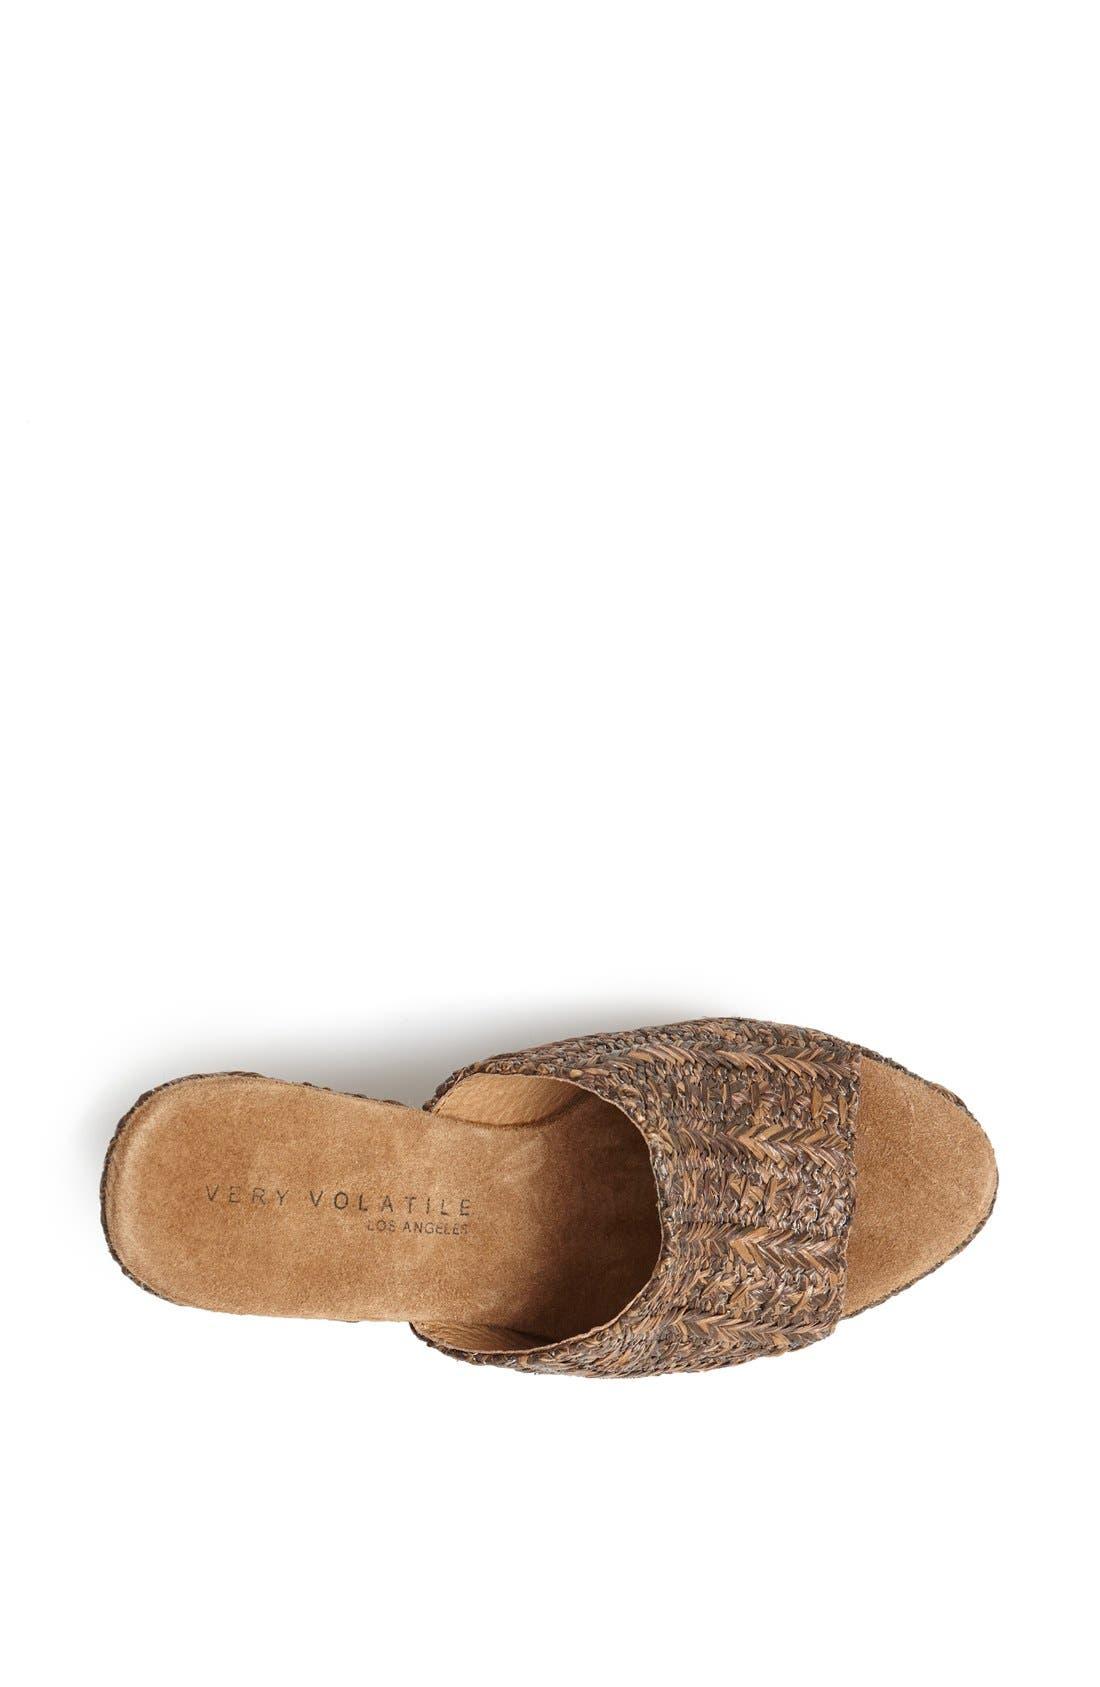 Alternate Image 3  - Very Volatile 'Sandstone' Wedge Sandal